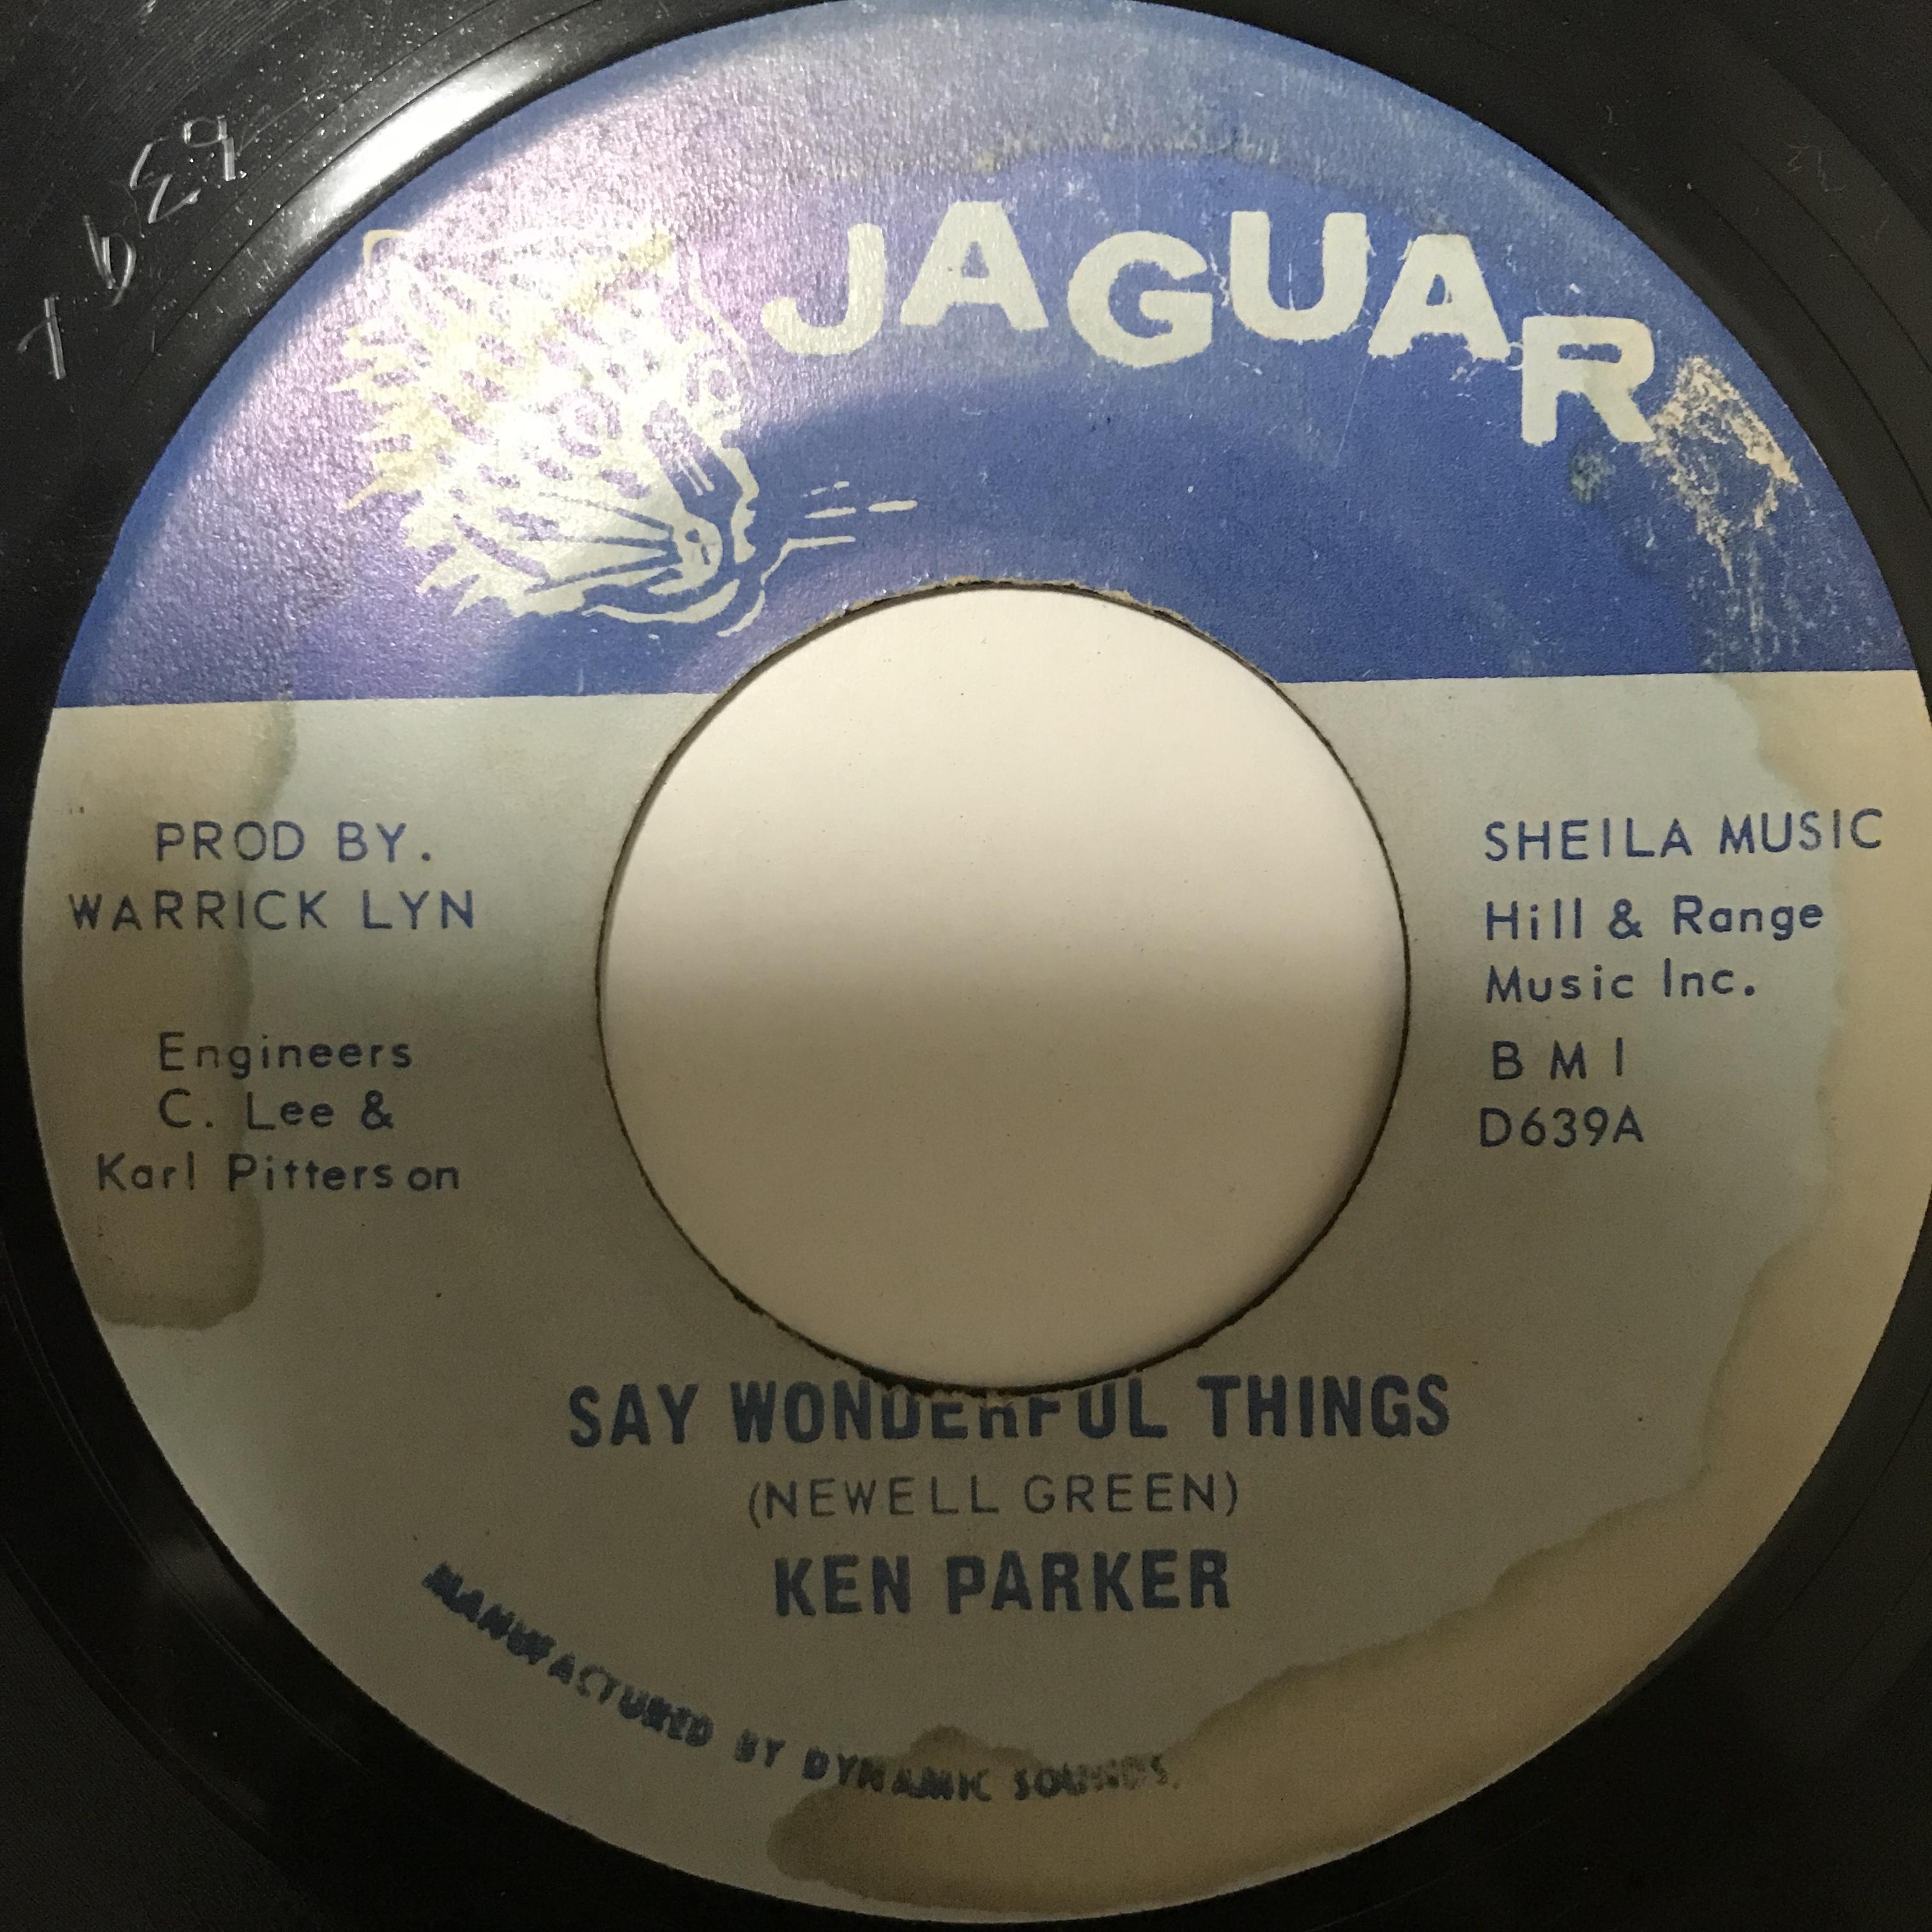 Ken Parker(ケン パーカー) - Say Wonderful Things / It's True【7-10761】